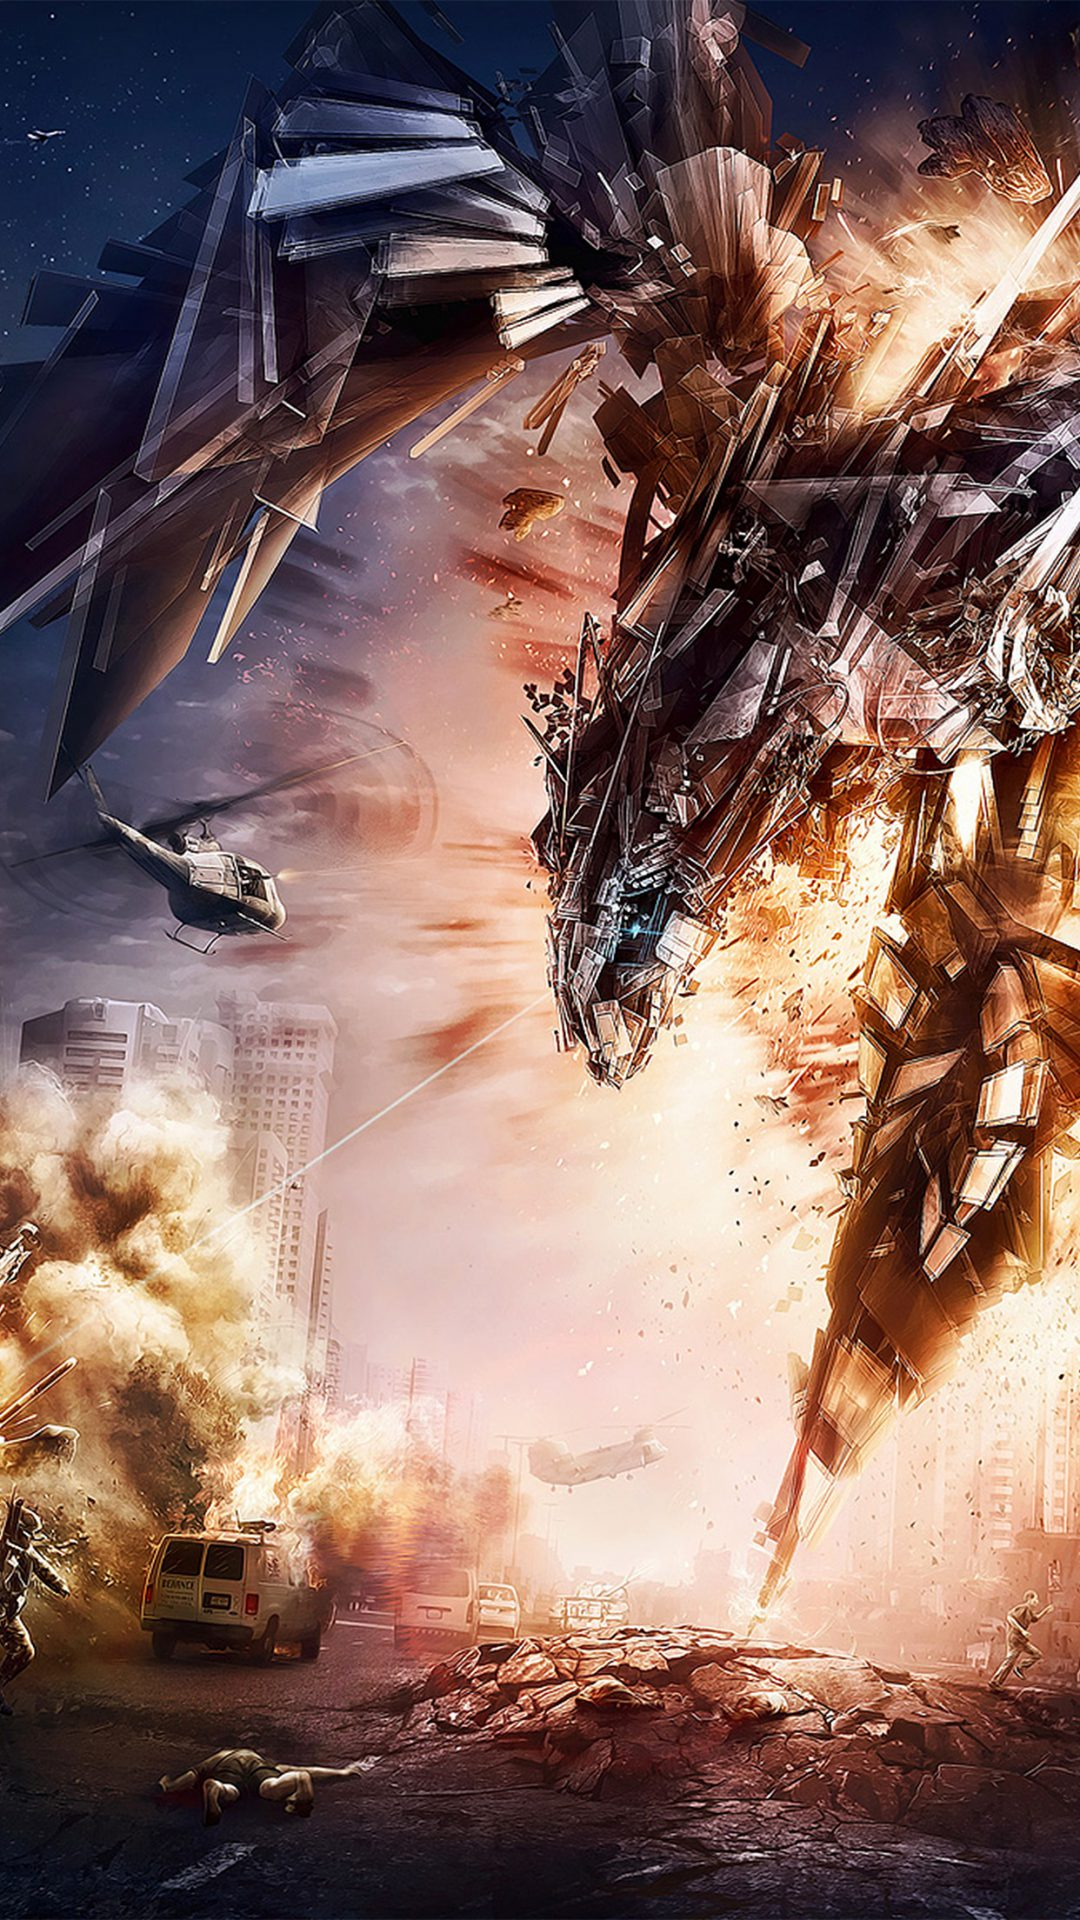 Transformers Artwork Film Illustration